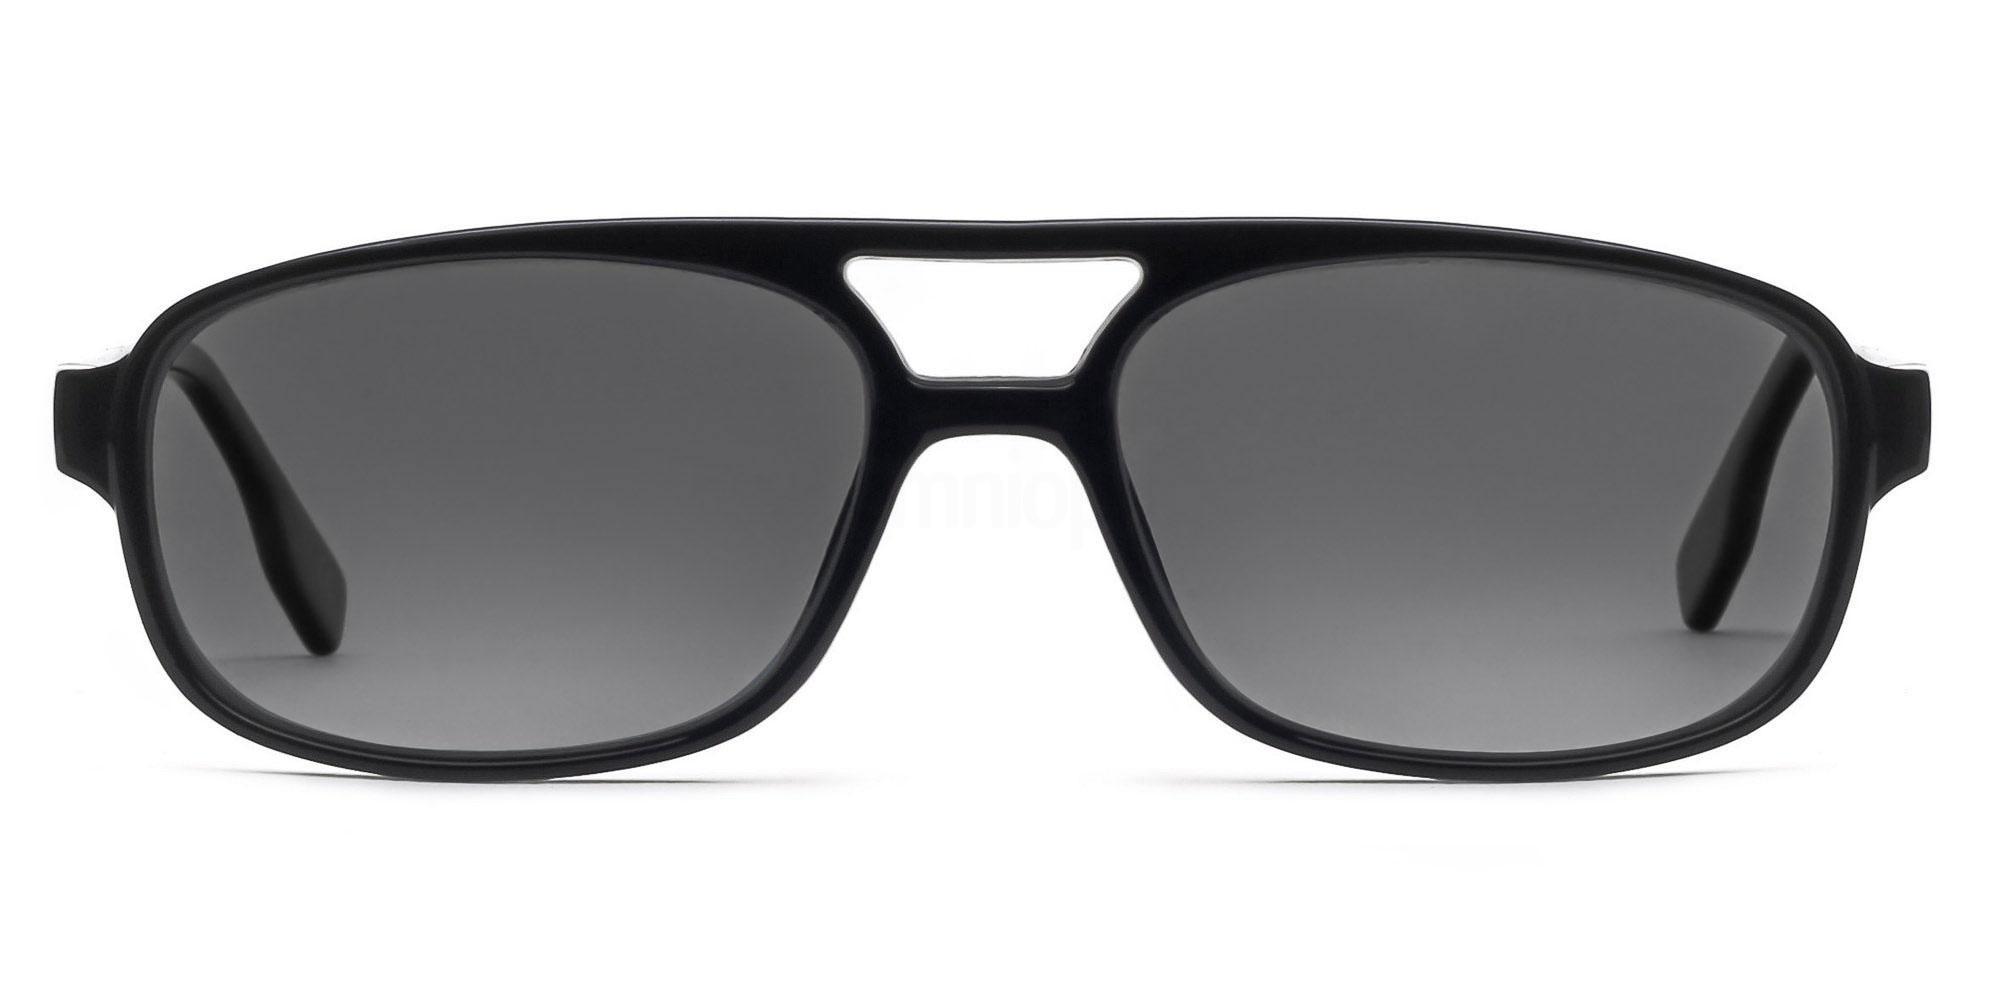 C01 Polarized Grey P2395 - Black (Polarized) Sunglasses, Savannah